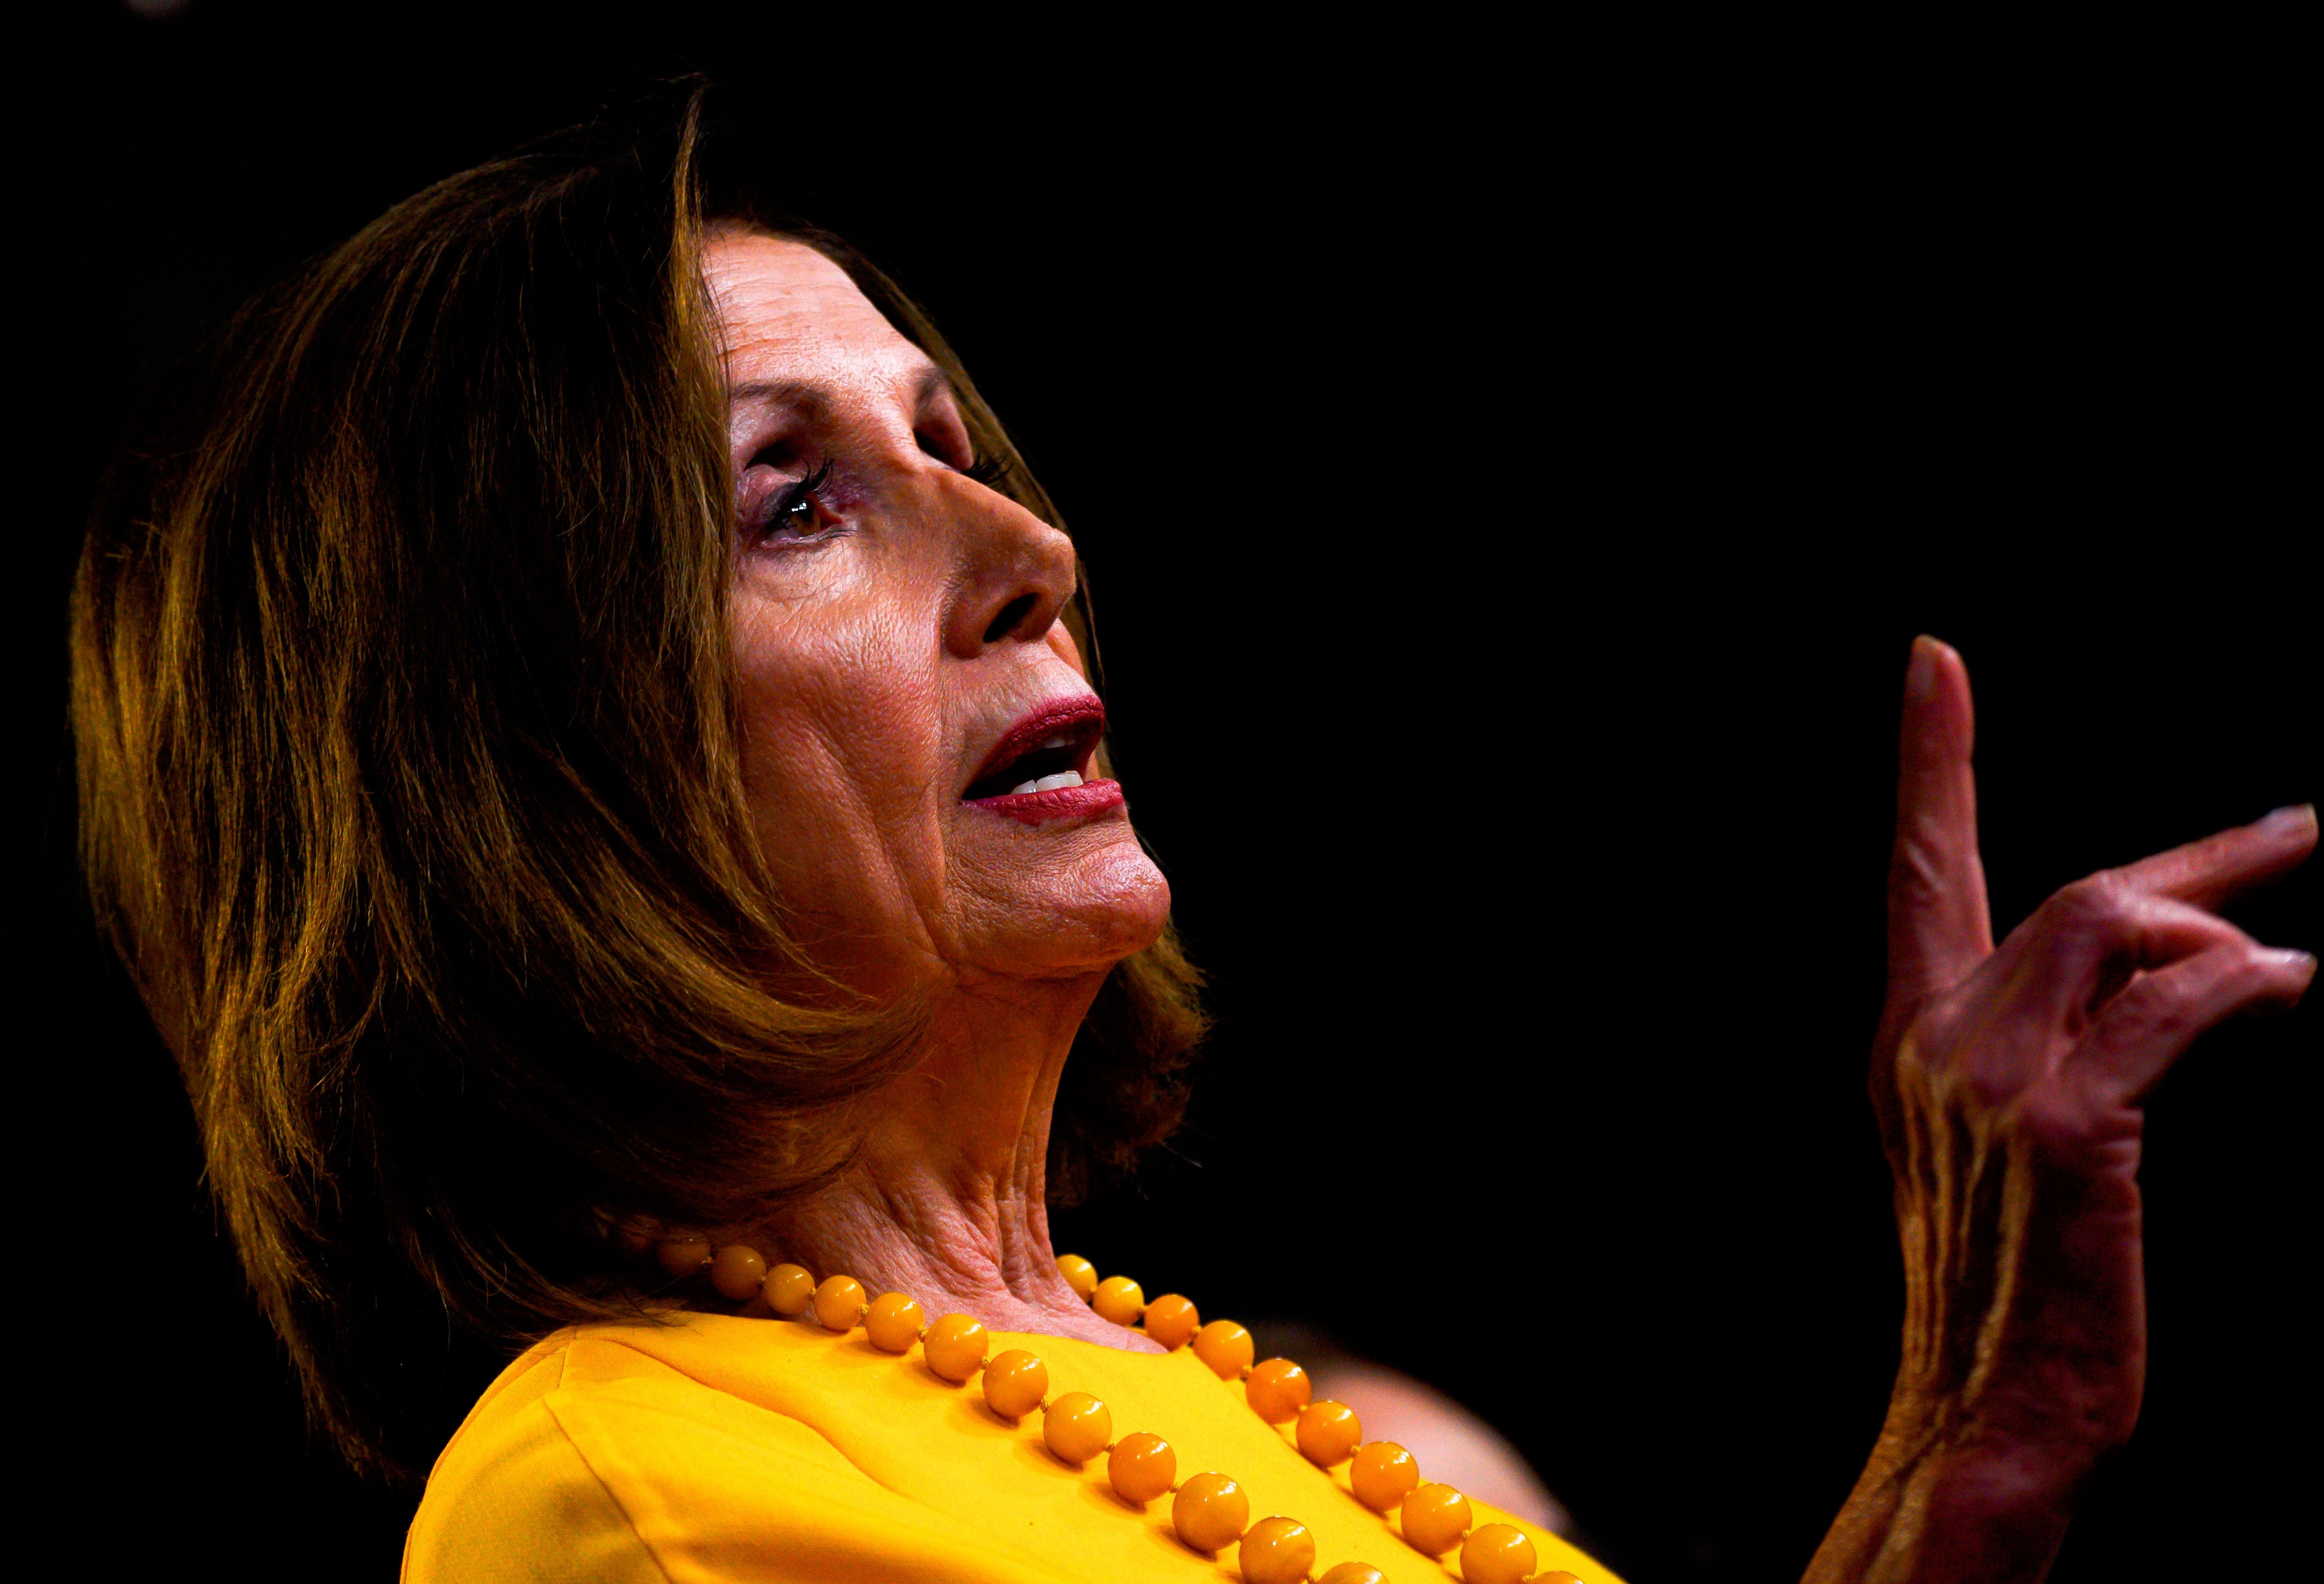 Nancy Pelosi Announces Impeachment Inquiry Of Trump: 'No One Is Above The Law'